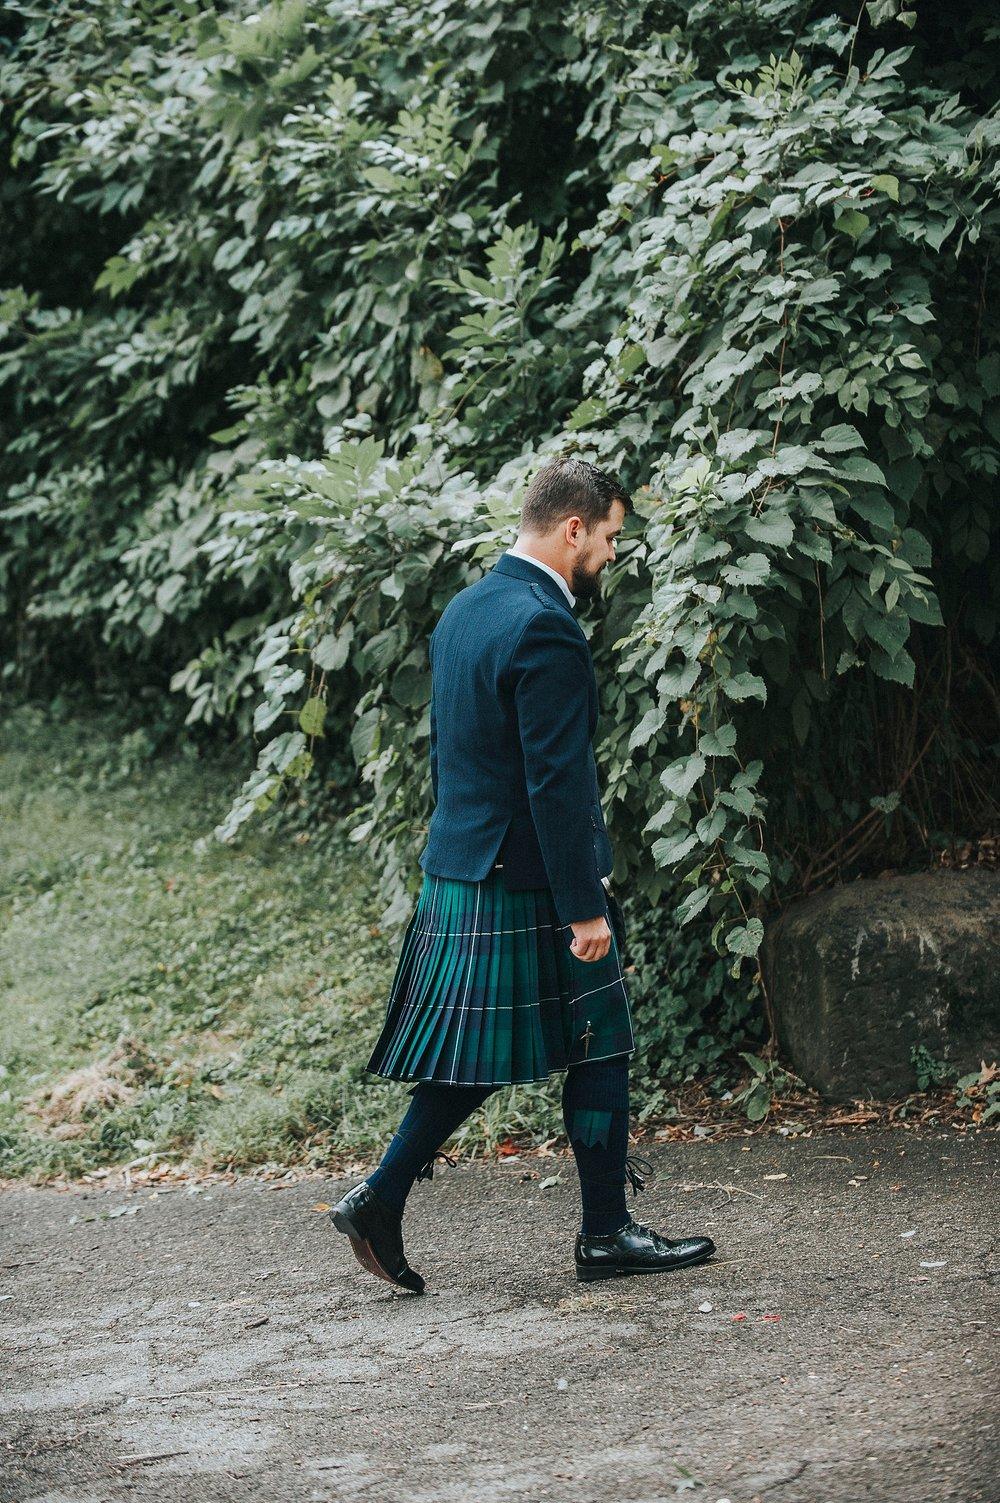 Hipster Wedding Photographer Lawrenceville Sandrachile